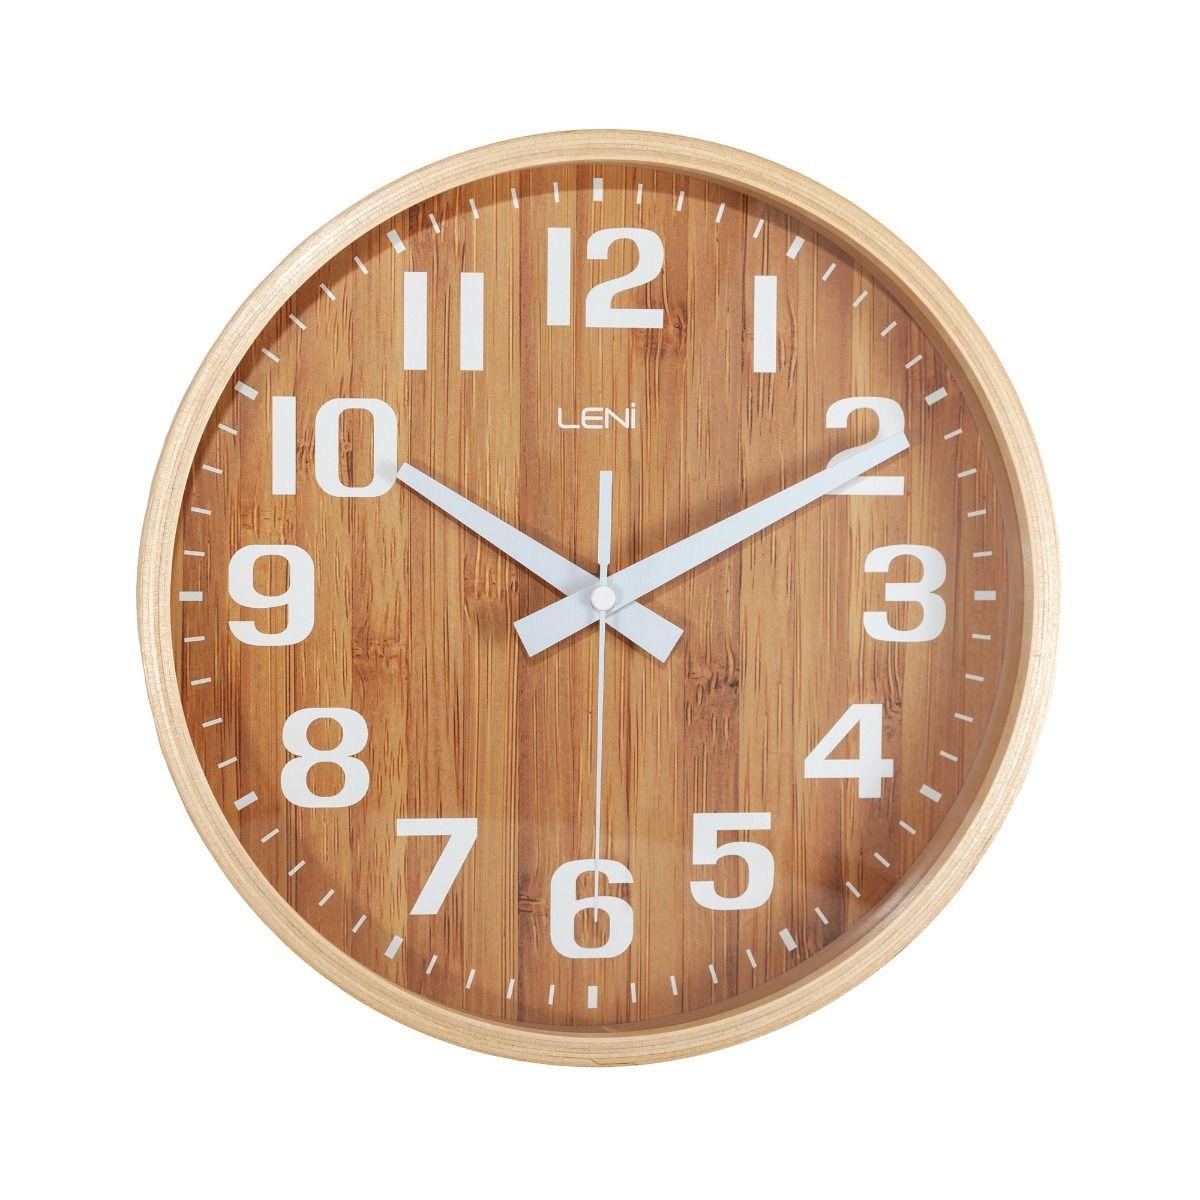 Leni Natural Bamboo Silent Glass Wall Clock